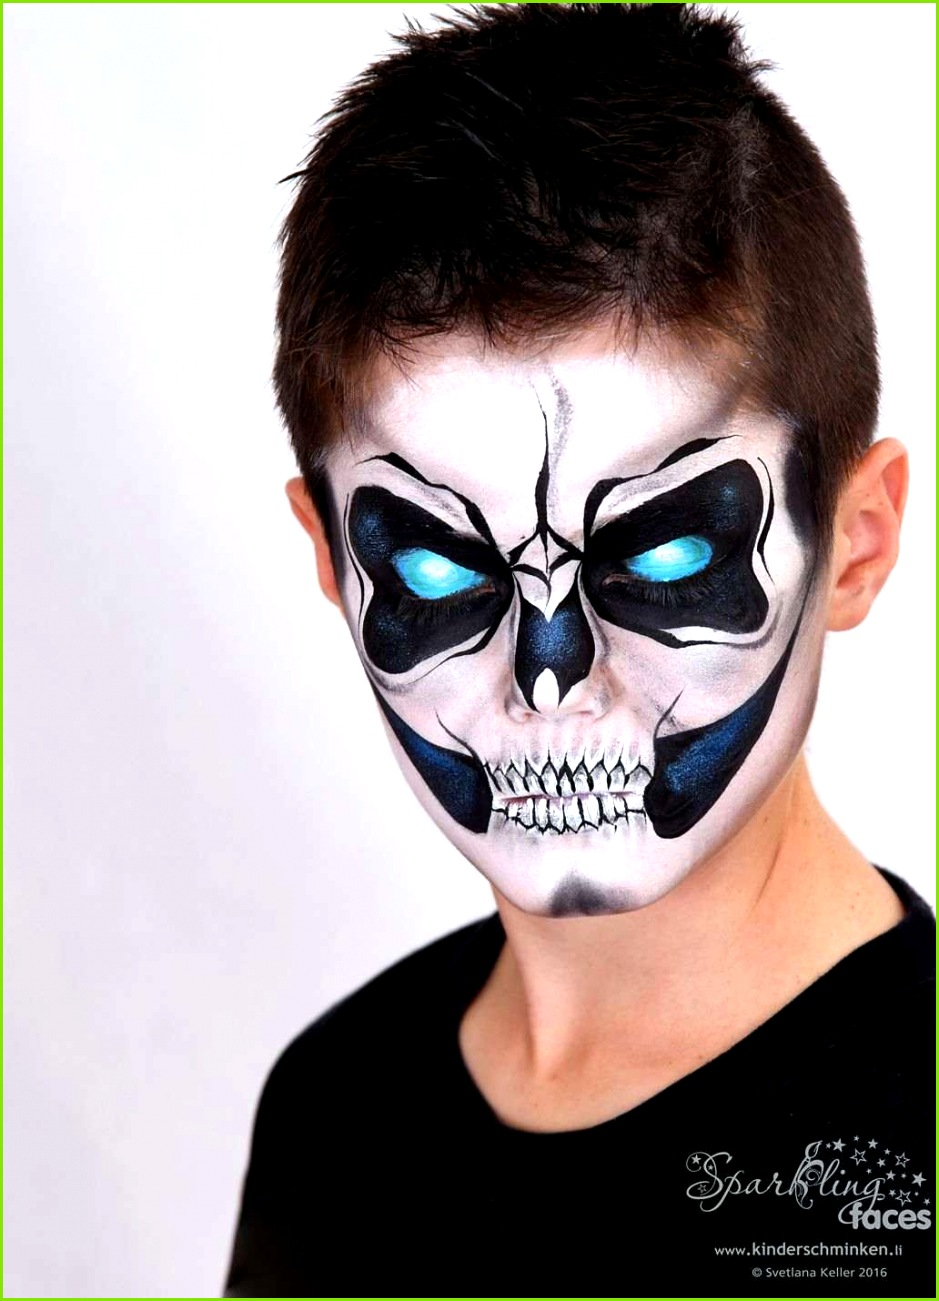 Halloween Schminken Vorlagen Pin by Katherine L Kids Face Painting Pinterest Halloween Schminken Vorlagen